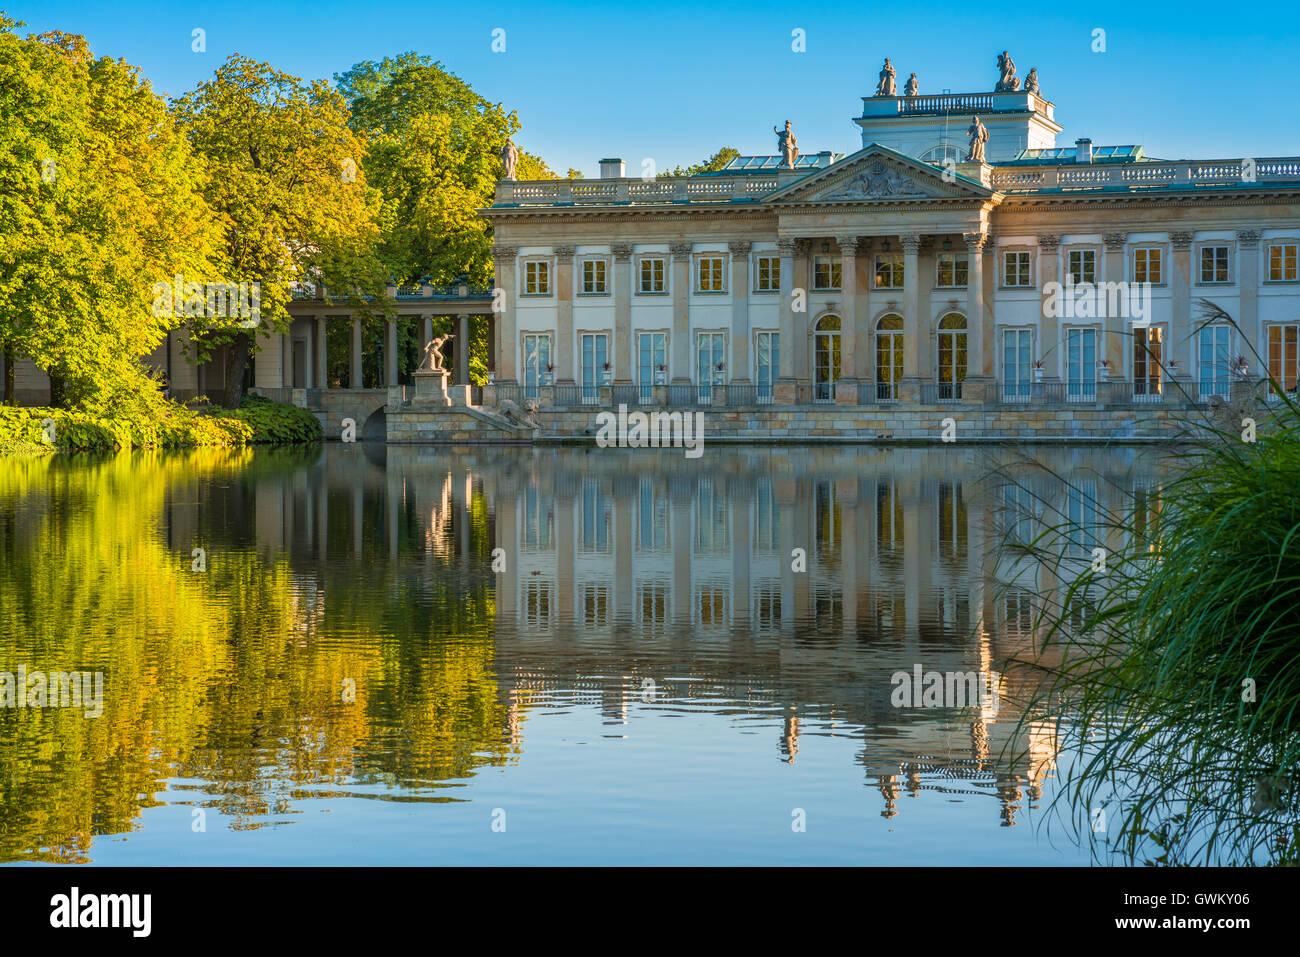 Lazienki Palast Im Lazienki Park Warschau Polen Stockfoto Bild